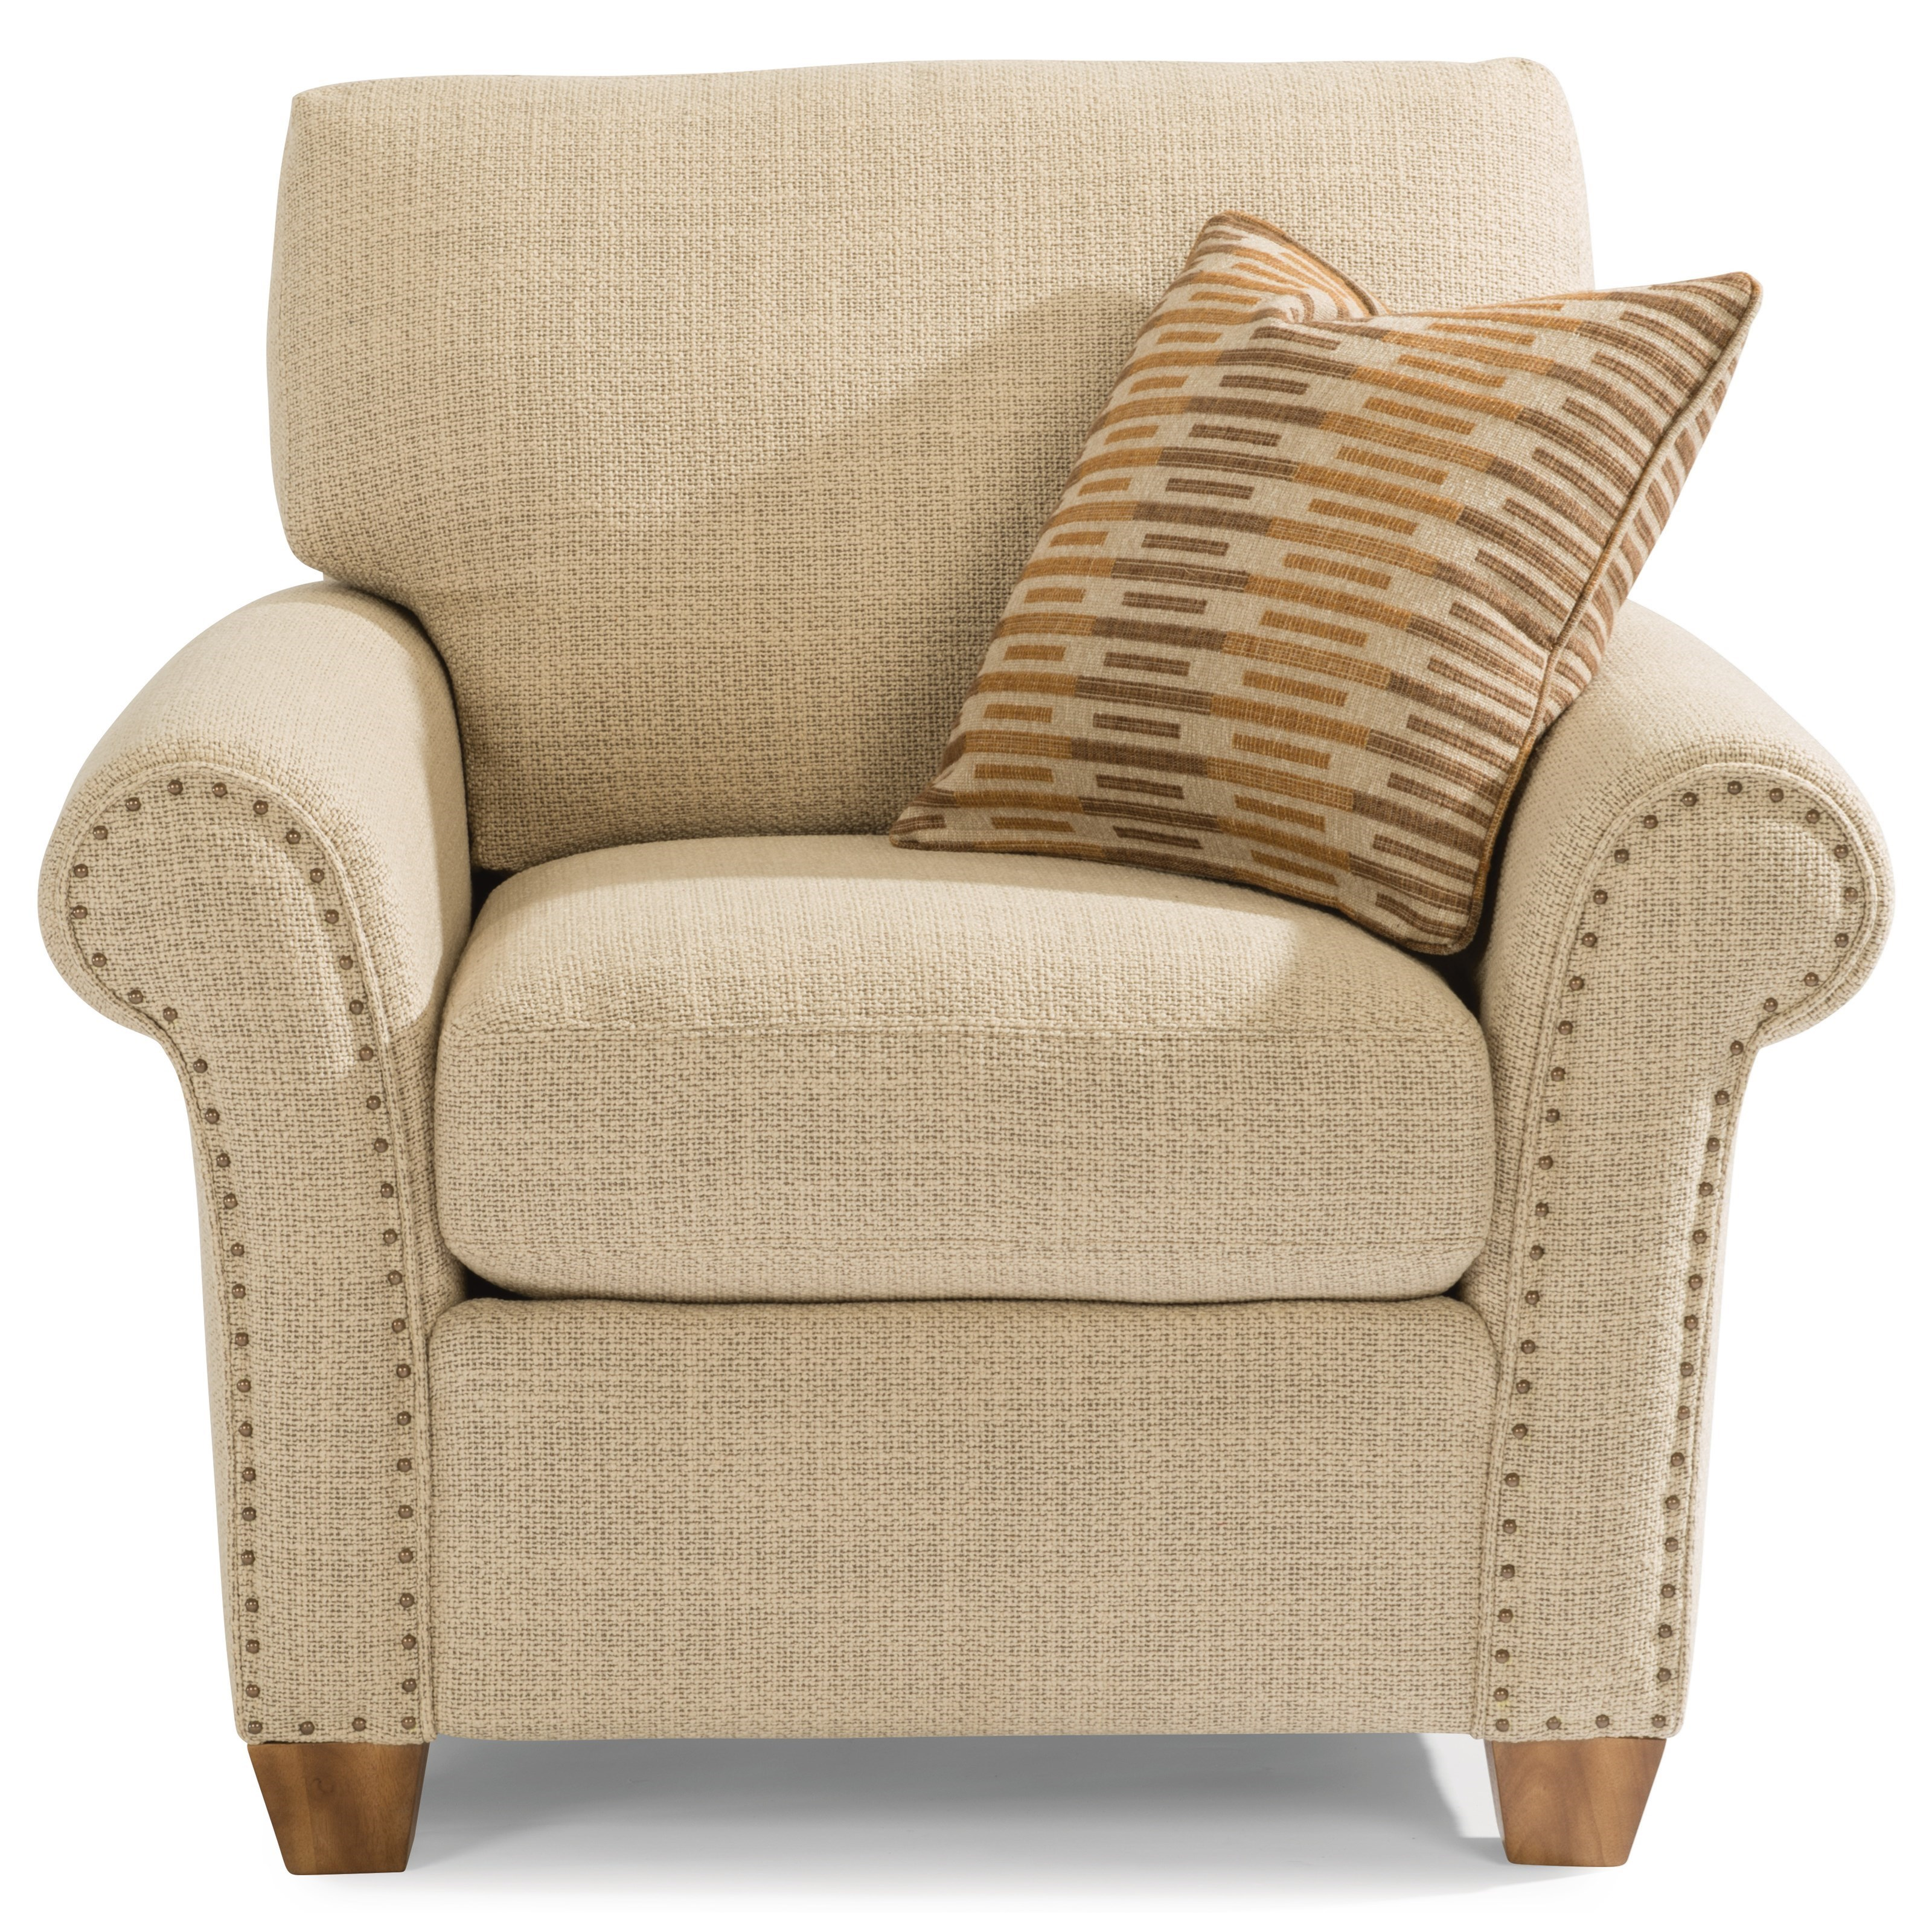 Flexsteel Christine Chair  - Item Number: 5110-10